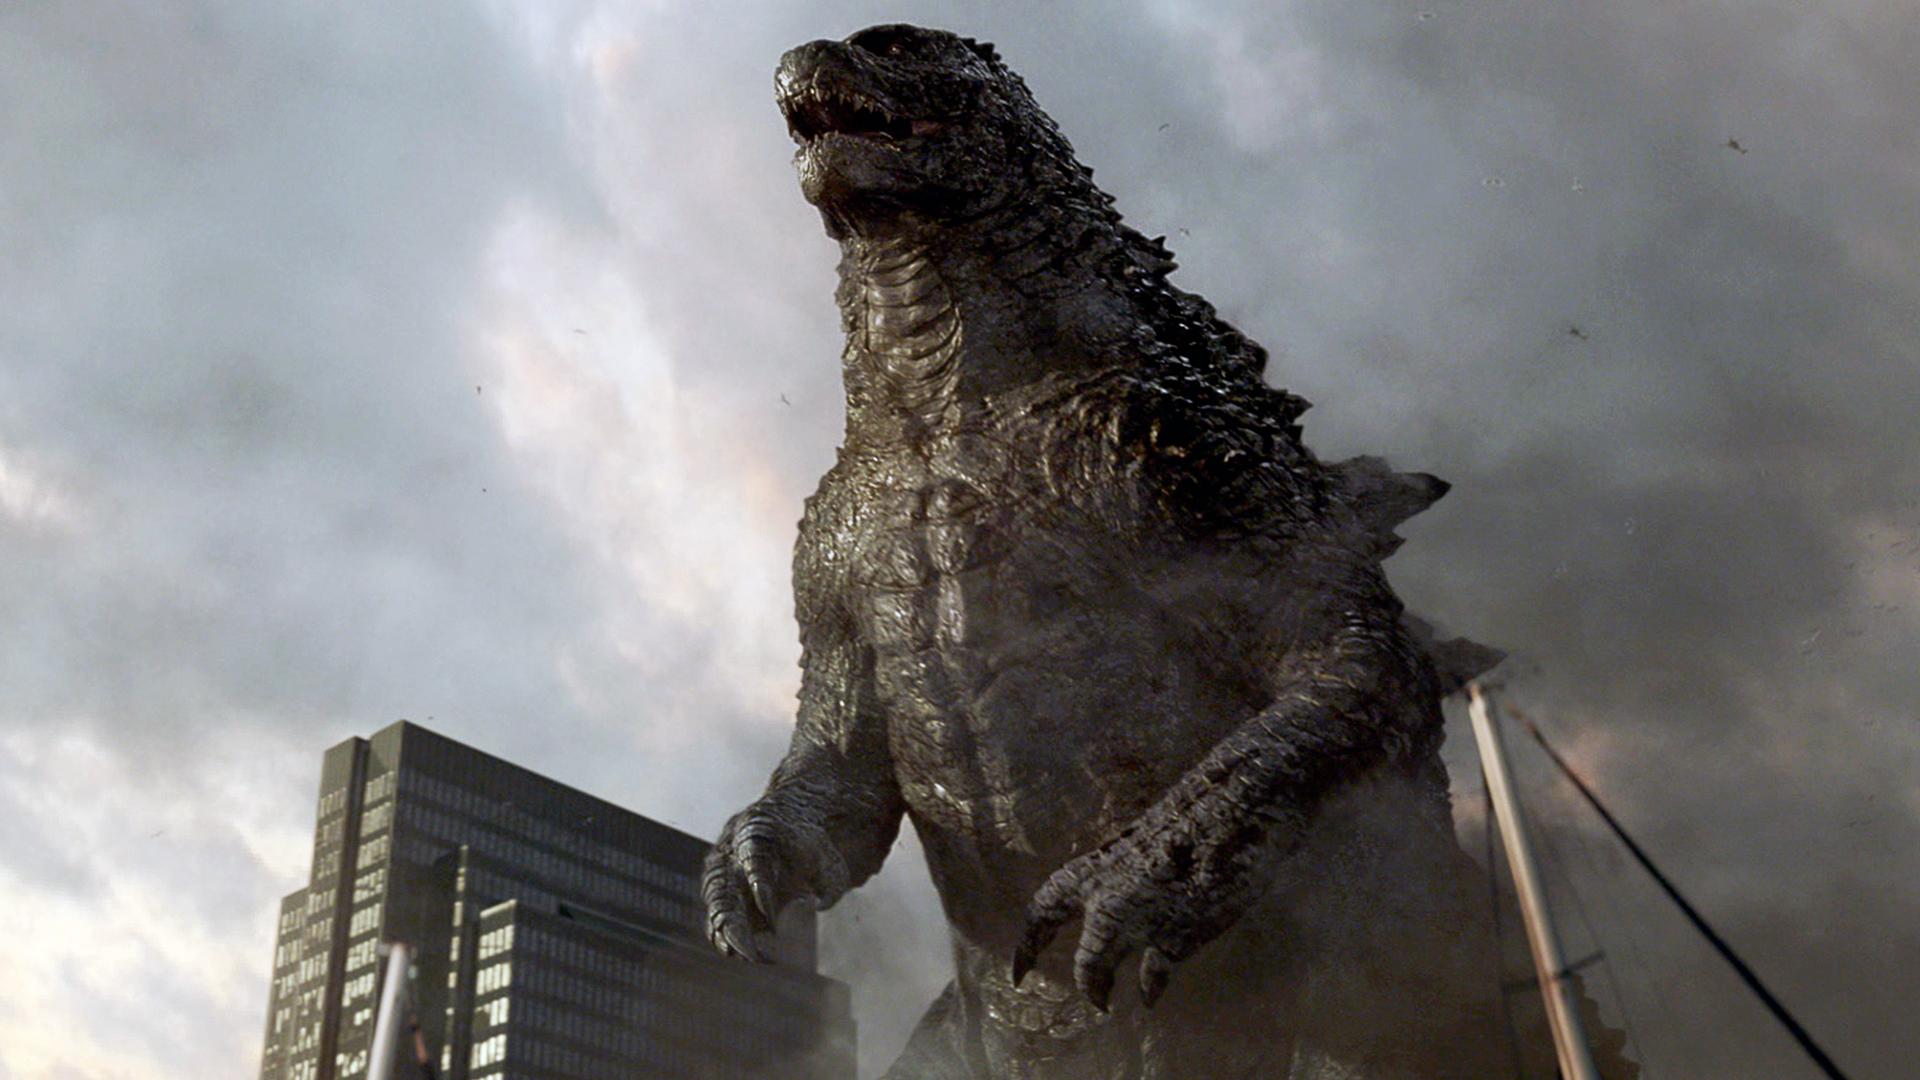 Godzilla Image 2014 Movie 14 Wallpaper HD 1920x1080